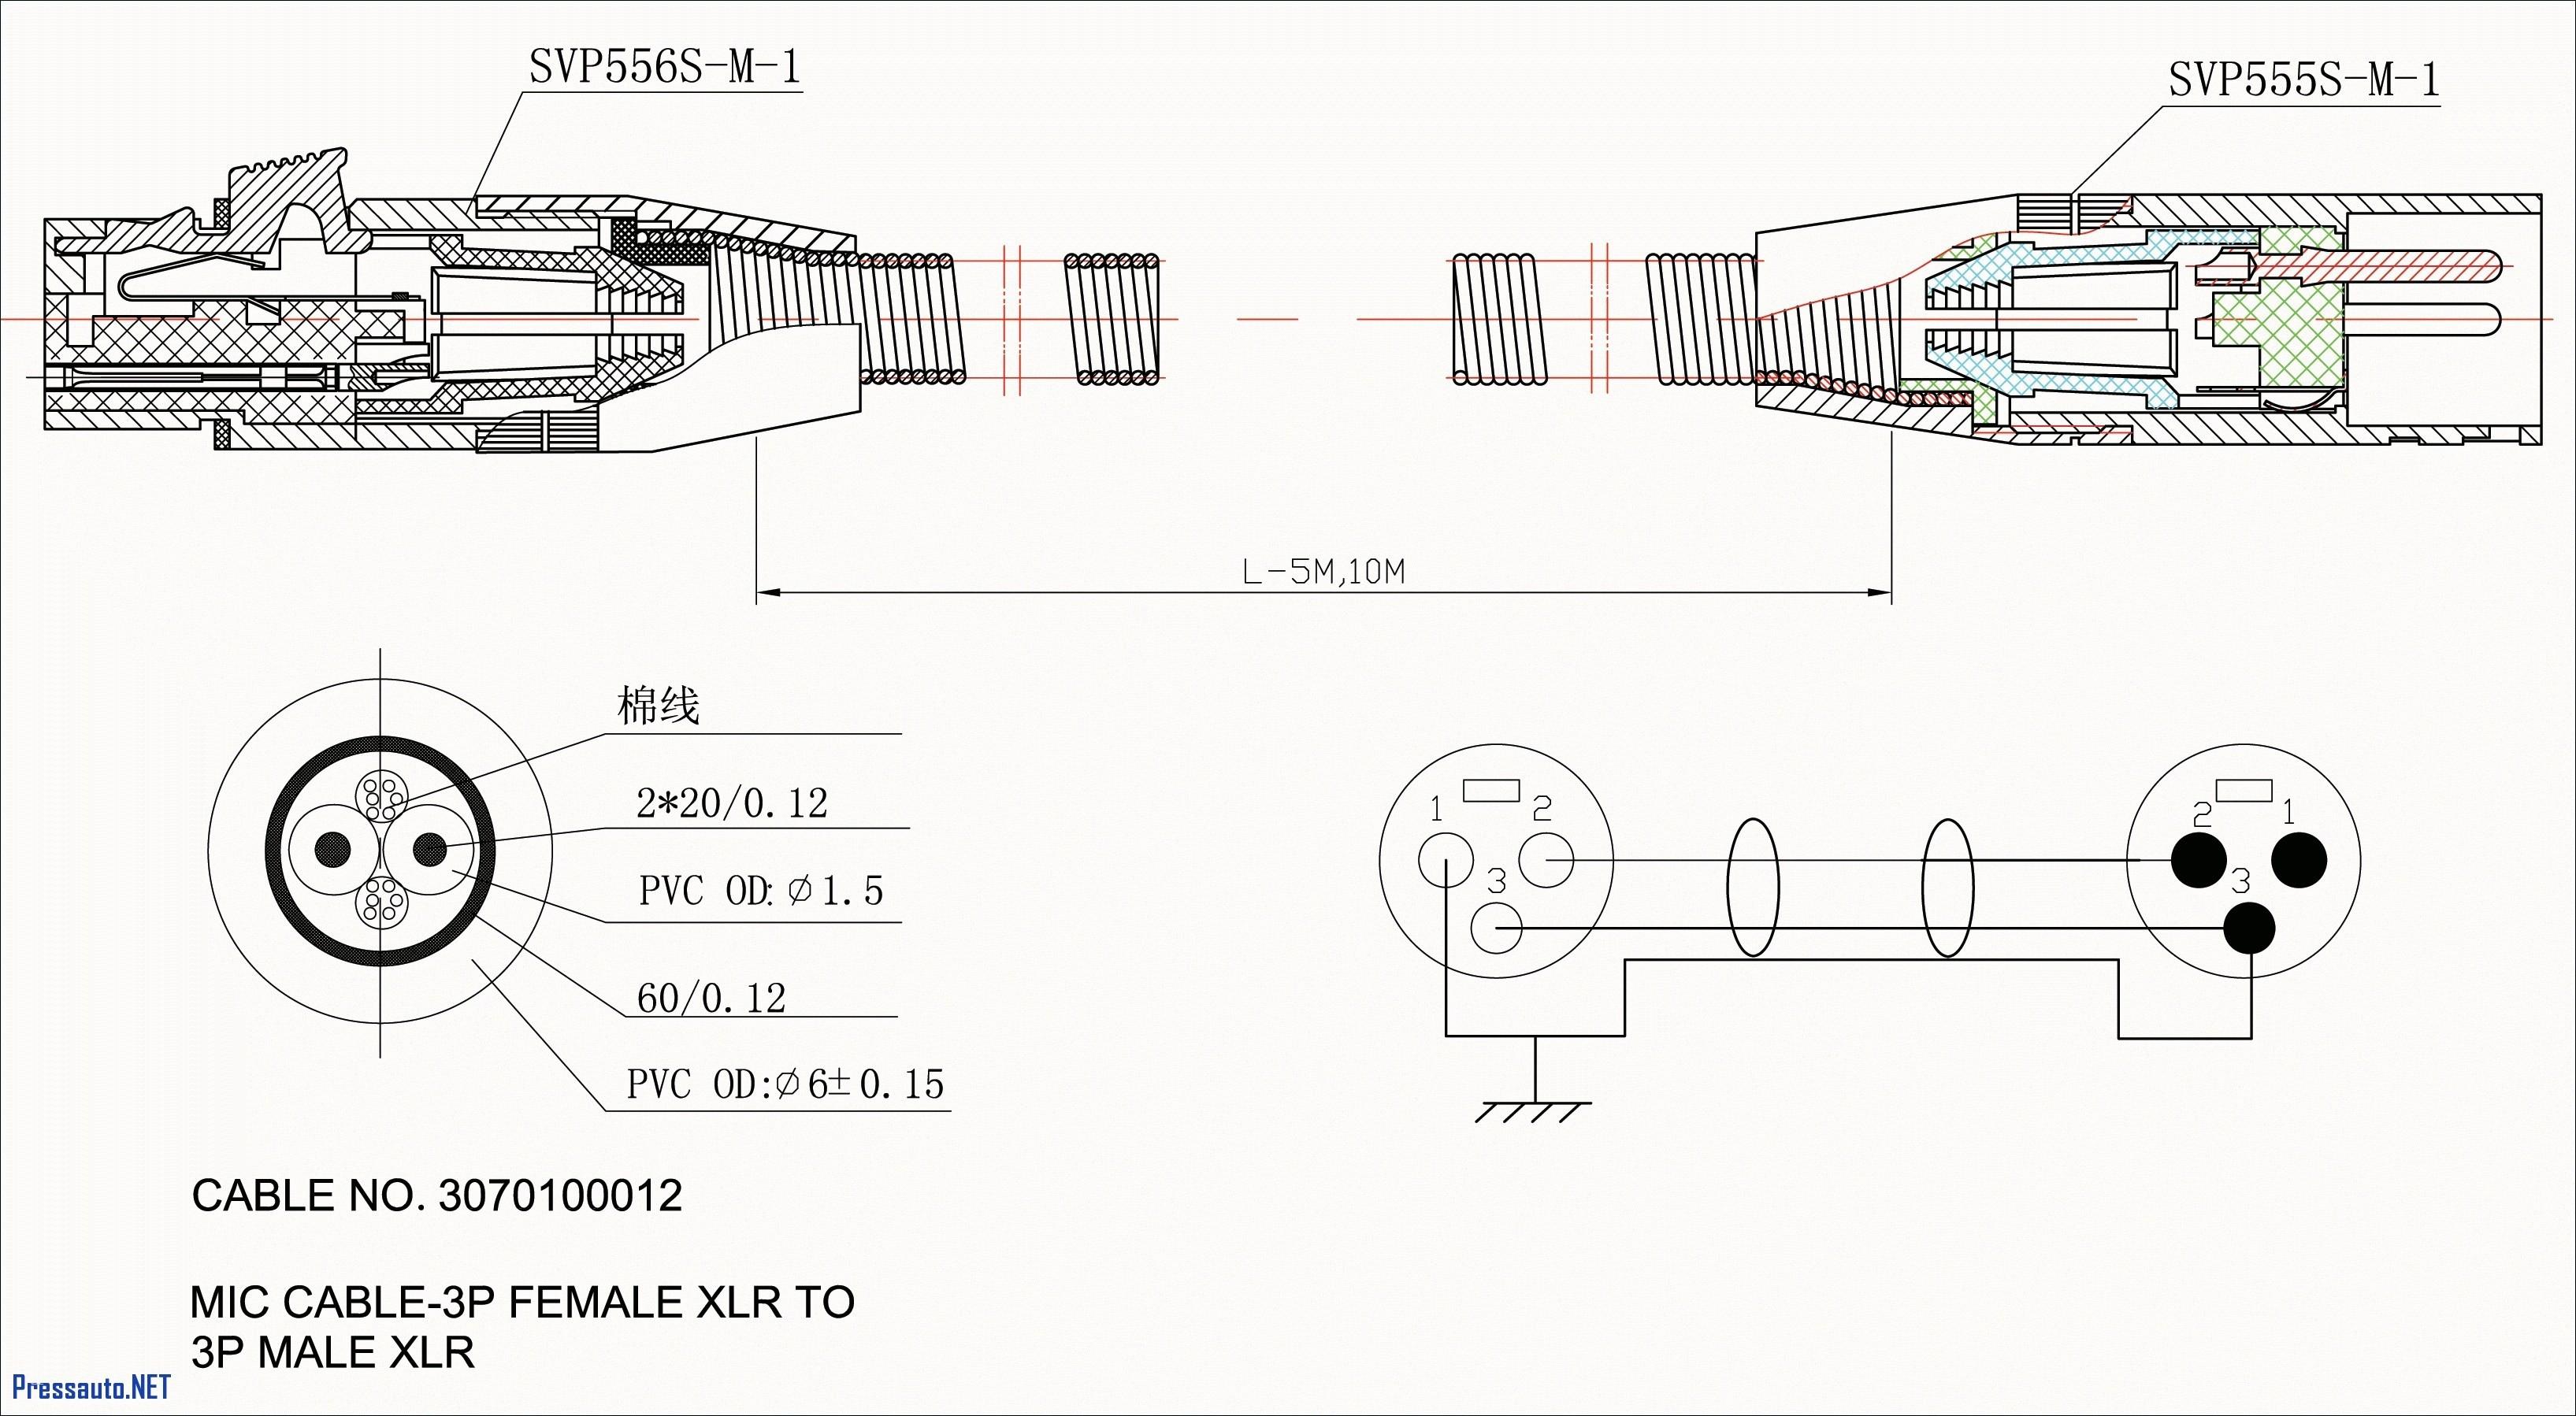 Fuel Line Diagram Chevy Truck Fuel System Wiring Diagram Detailed Schematics Diagram Of Fuel Line Diagram Chevy Truck